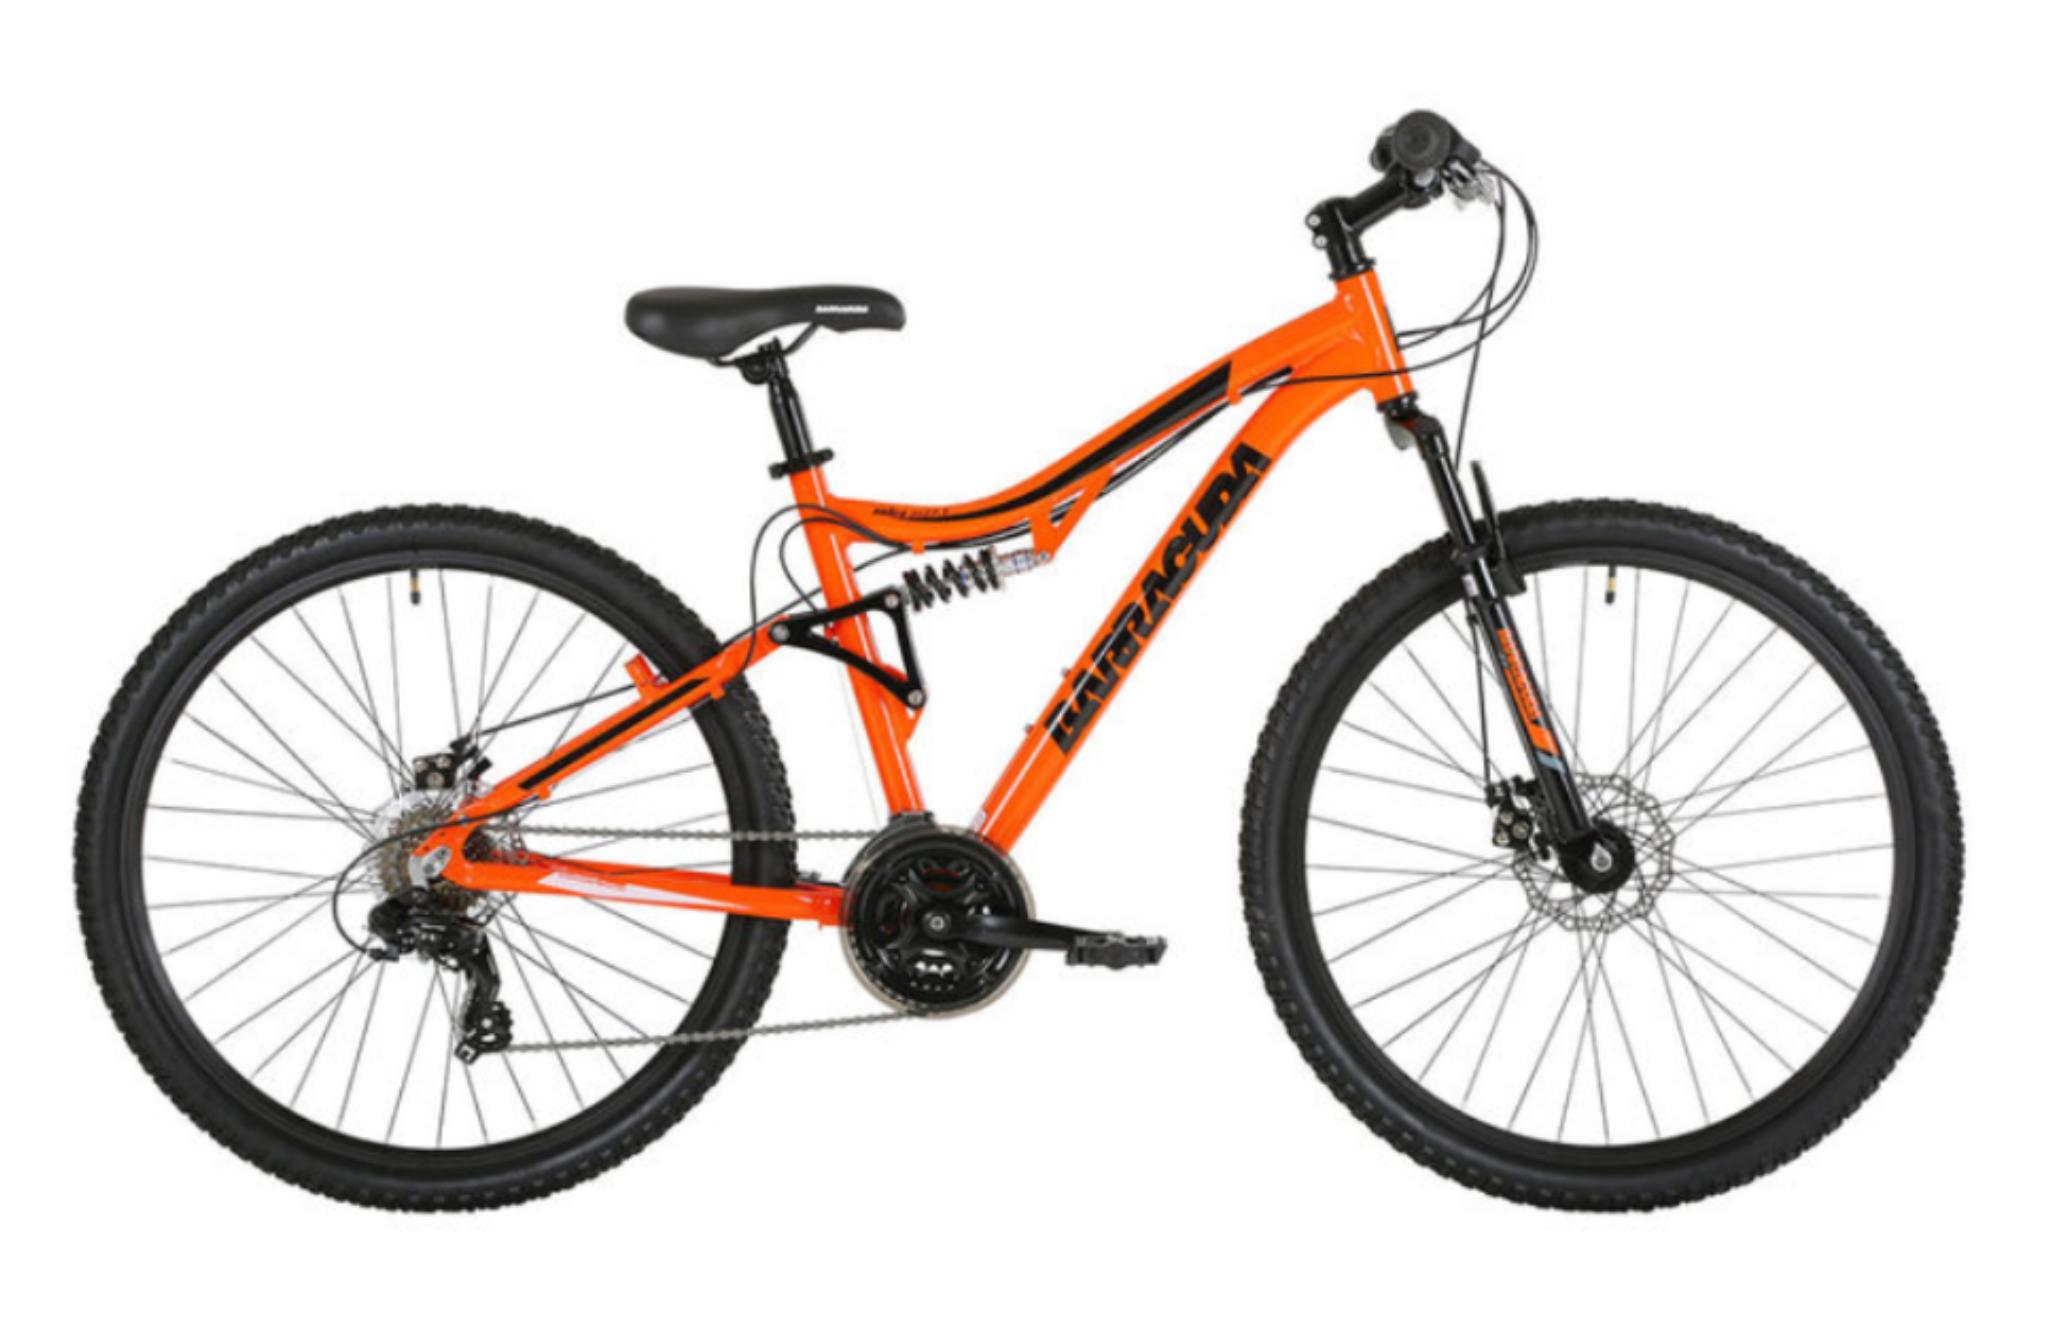 "Barracuda 27.5"" Draco DS Mountain Bike, Costco in store £191.98"